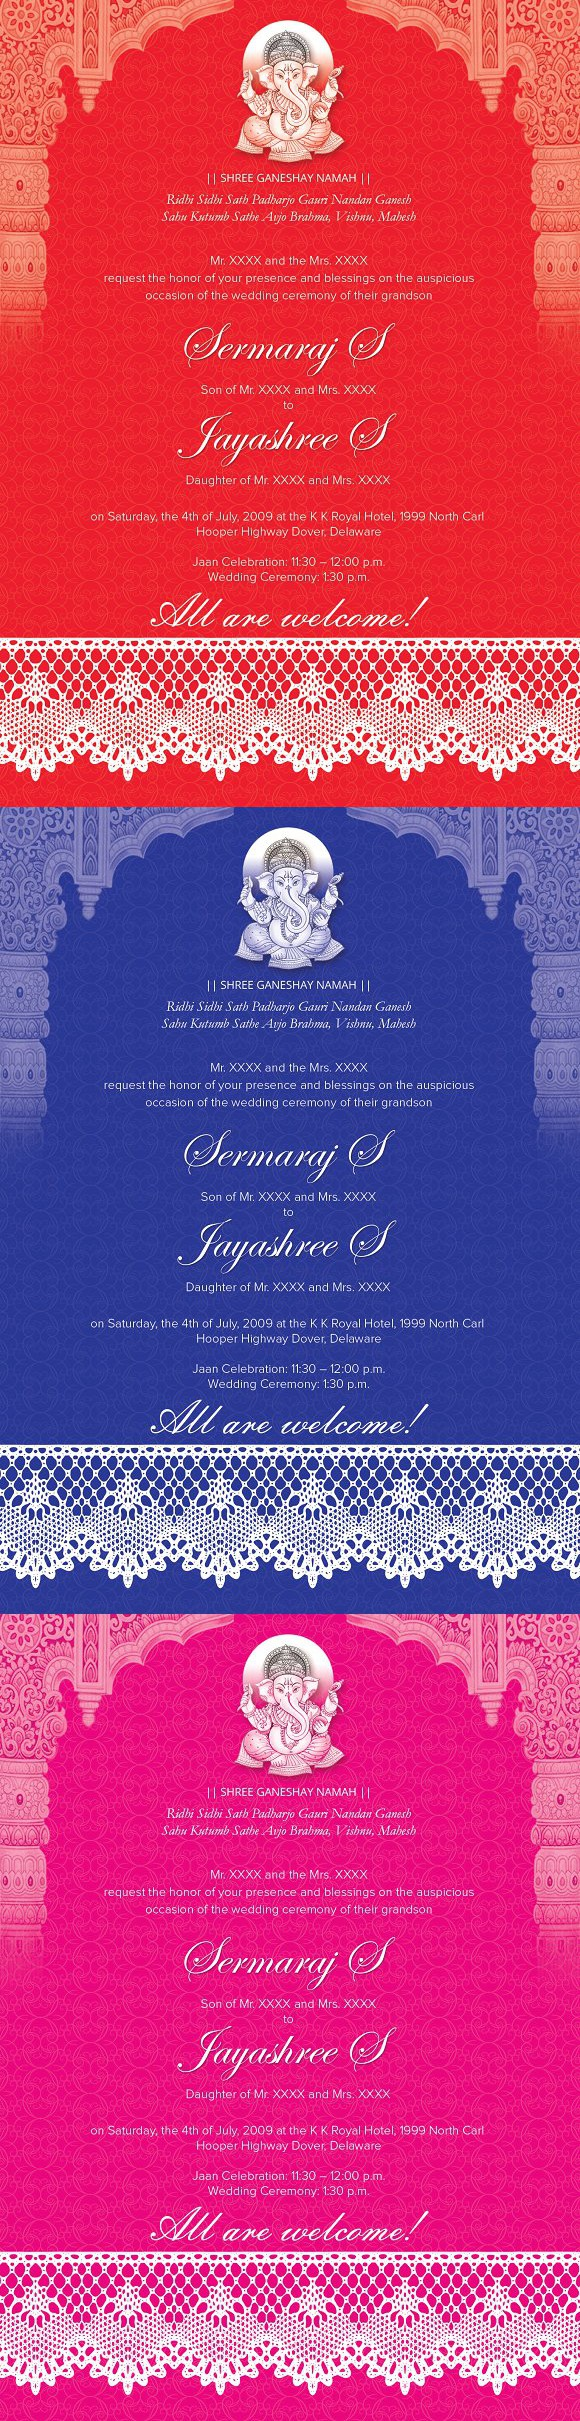 Indian Wedding Card 01 - 3 colors. Invitation Templates. $10.00 ...